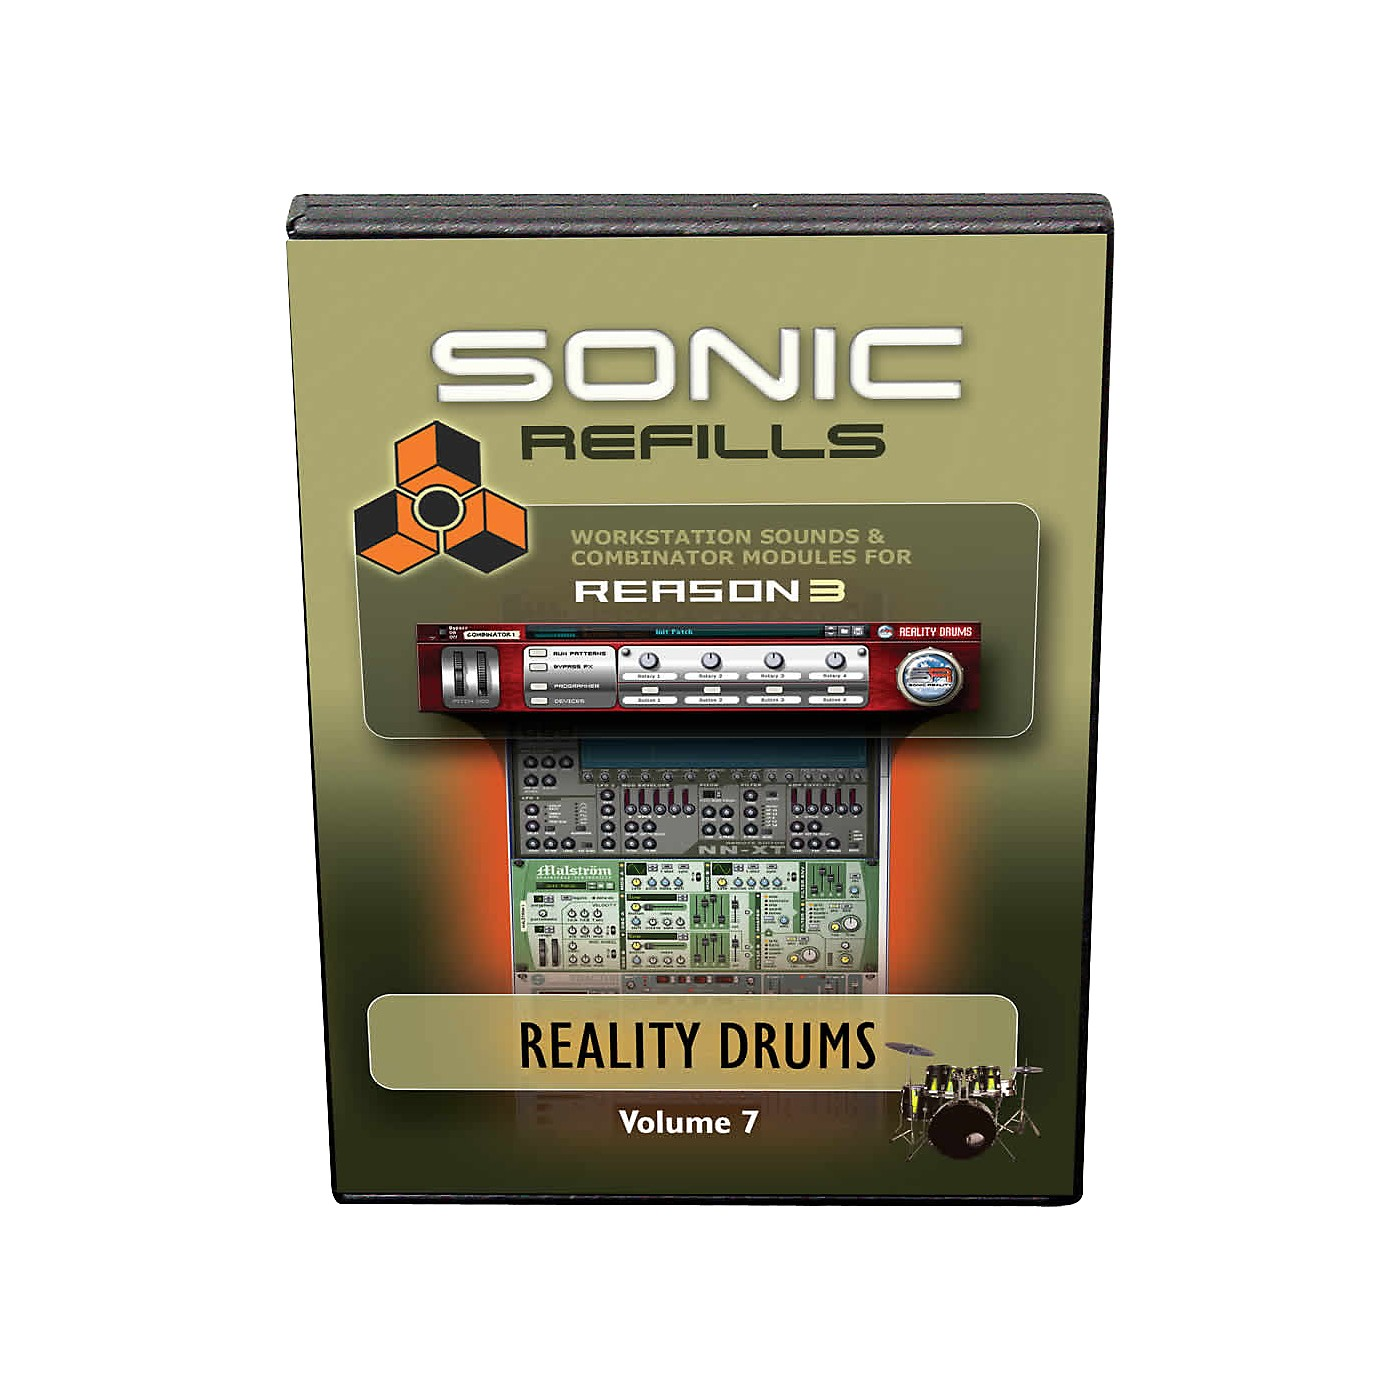 Sonic Reality Reason 3 Refills Vol. 07: Reality Drums thumbnail